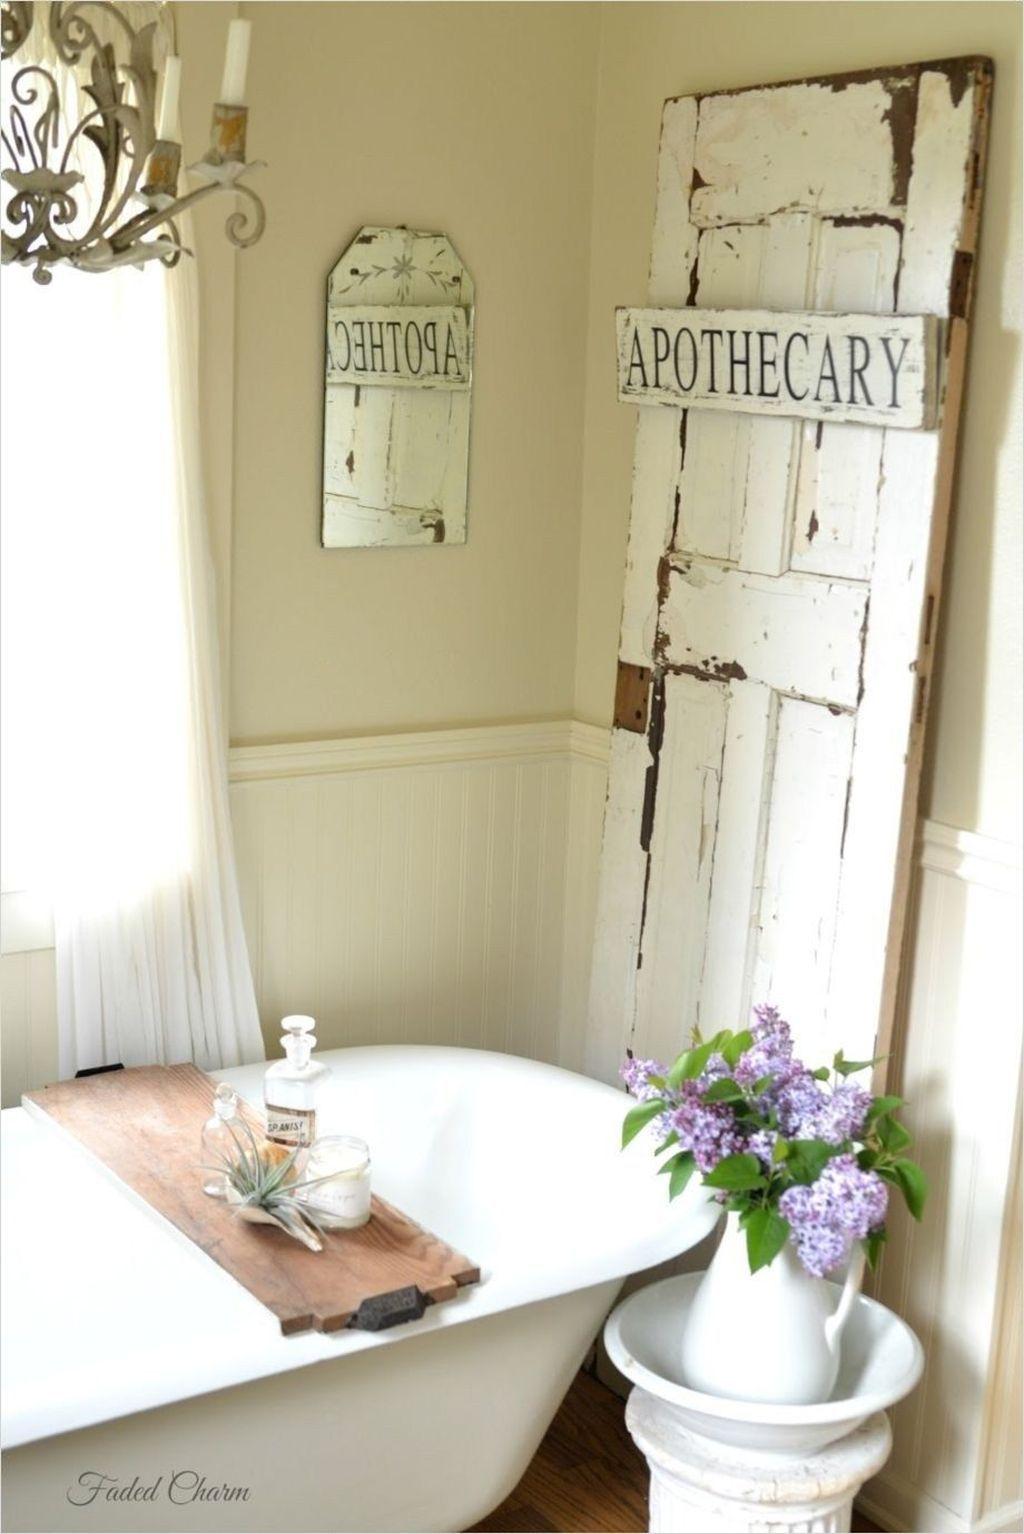 Outstanding 39 Simply Farmhouse Bathroom Accessories Ideas You Must Copy Interior Design Ideas Oteneahmetsinanyavuzinfo